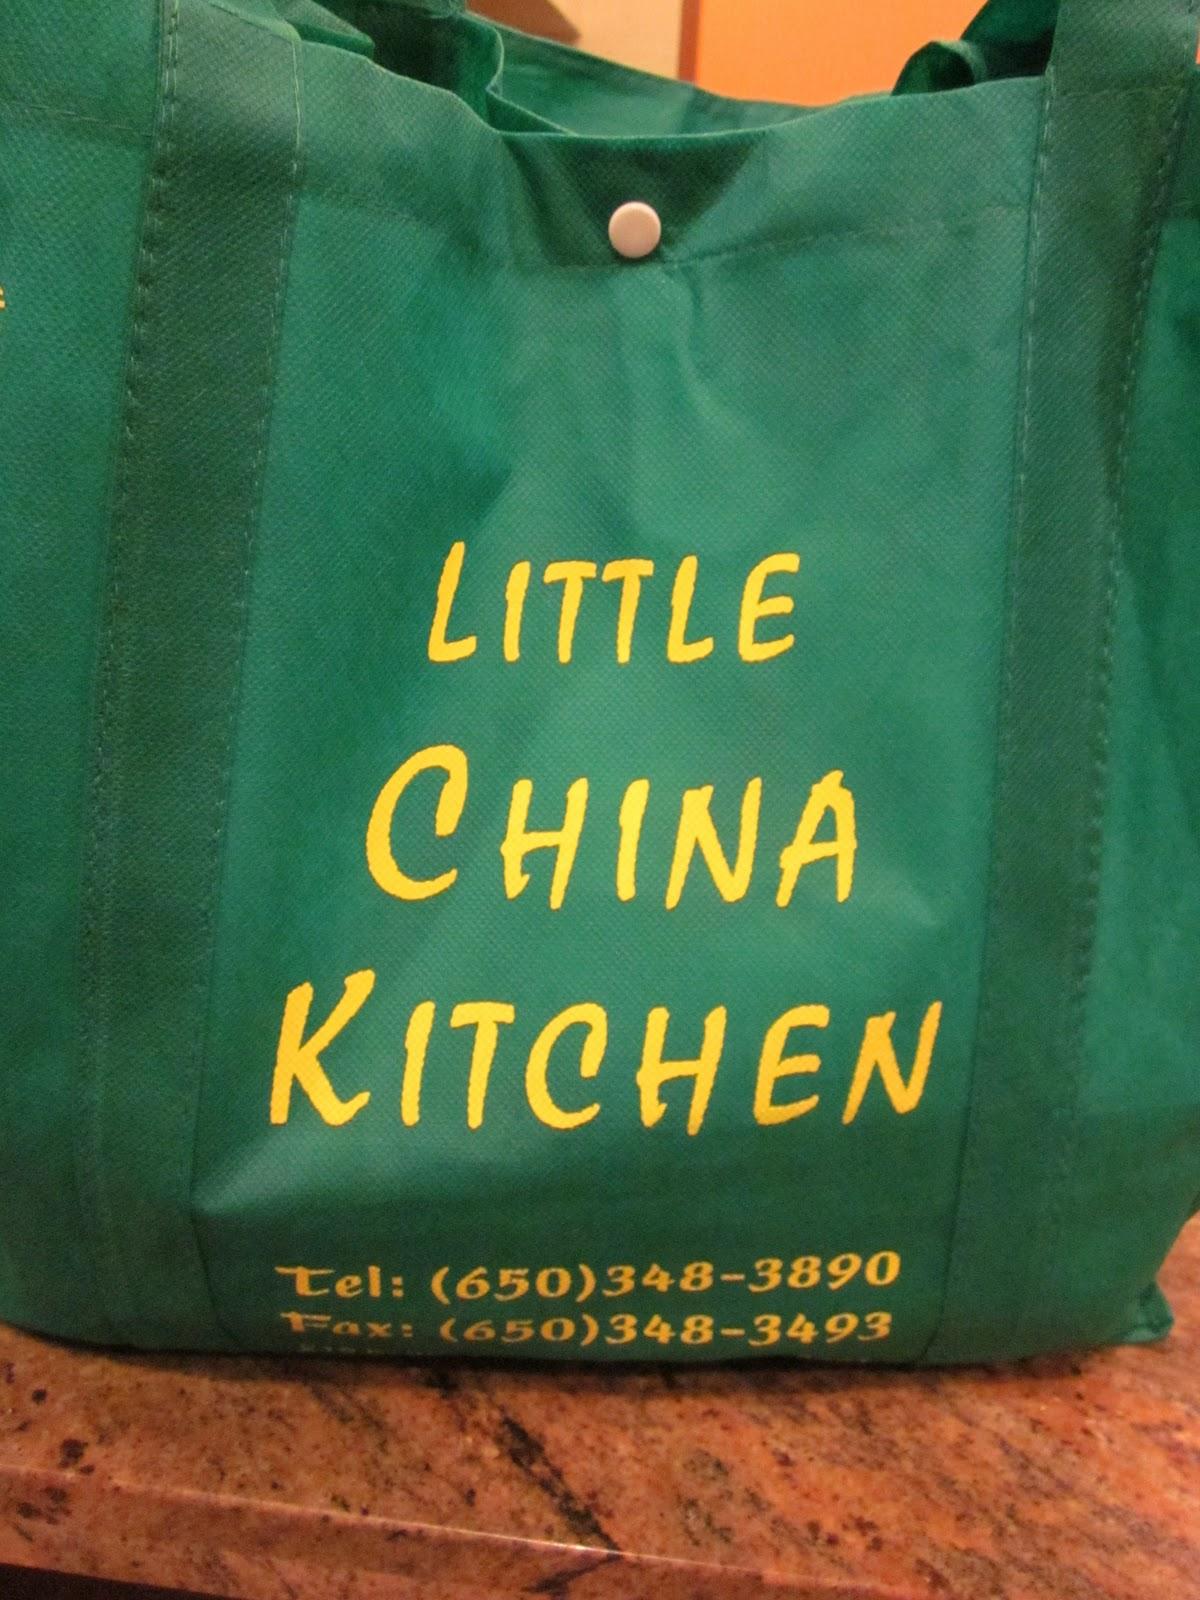 San Jose Food Blog: Little China Kitchen - San Mateo